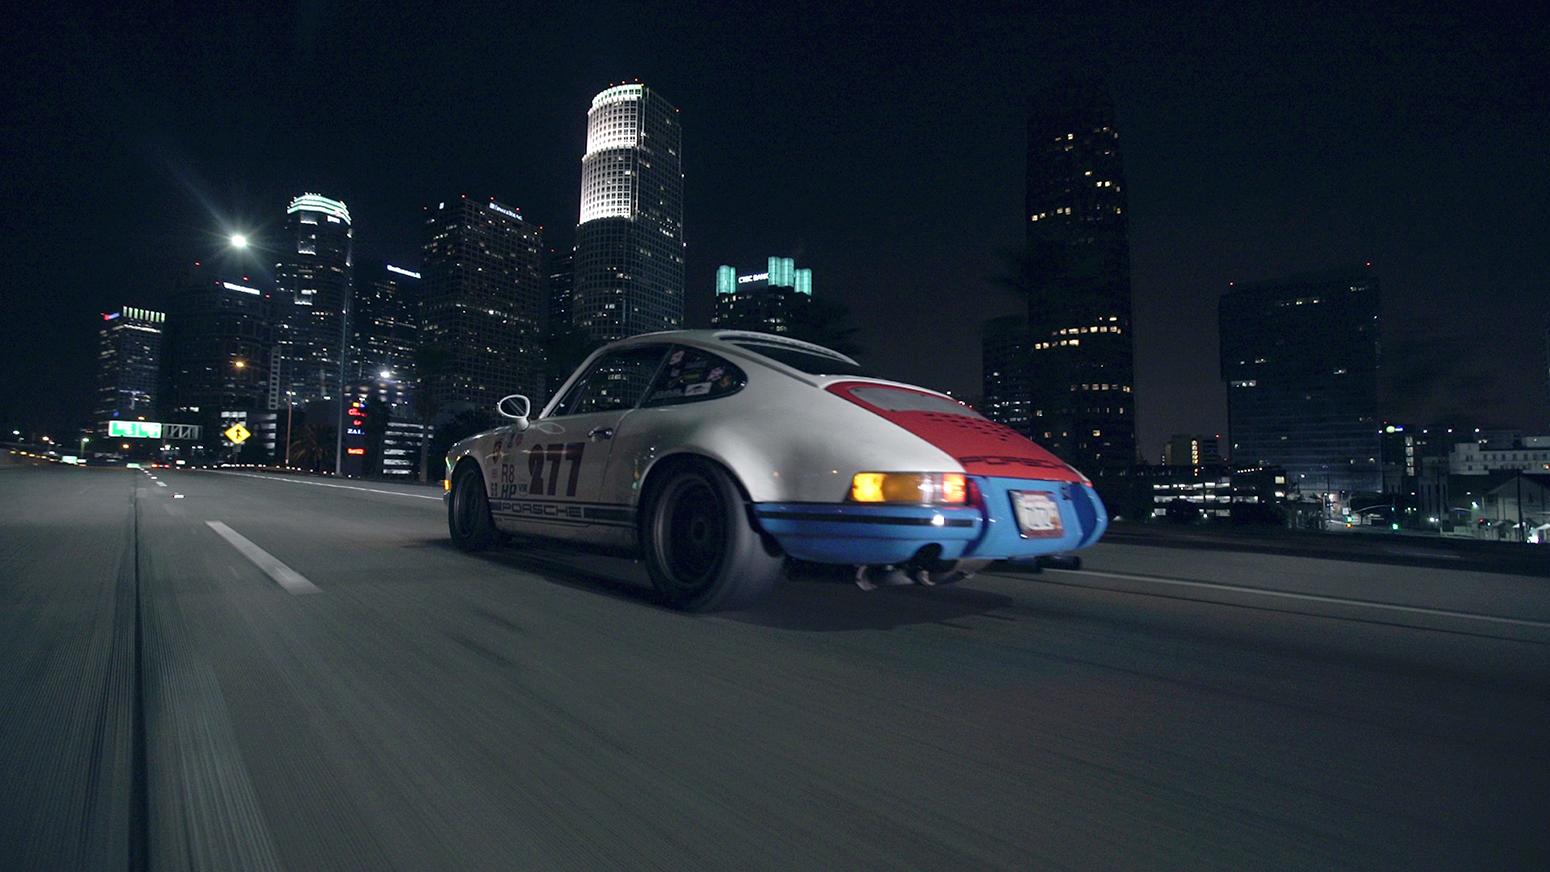 Midnight Rambler<a href=/midnight-rambler>→</a><strong>Midnight Run in Los Angeles</strong>